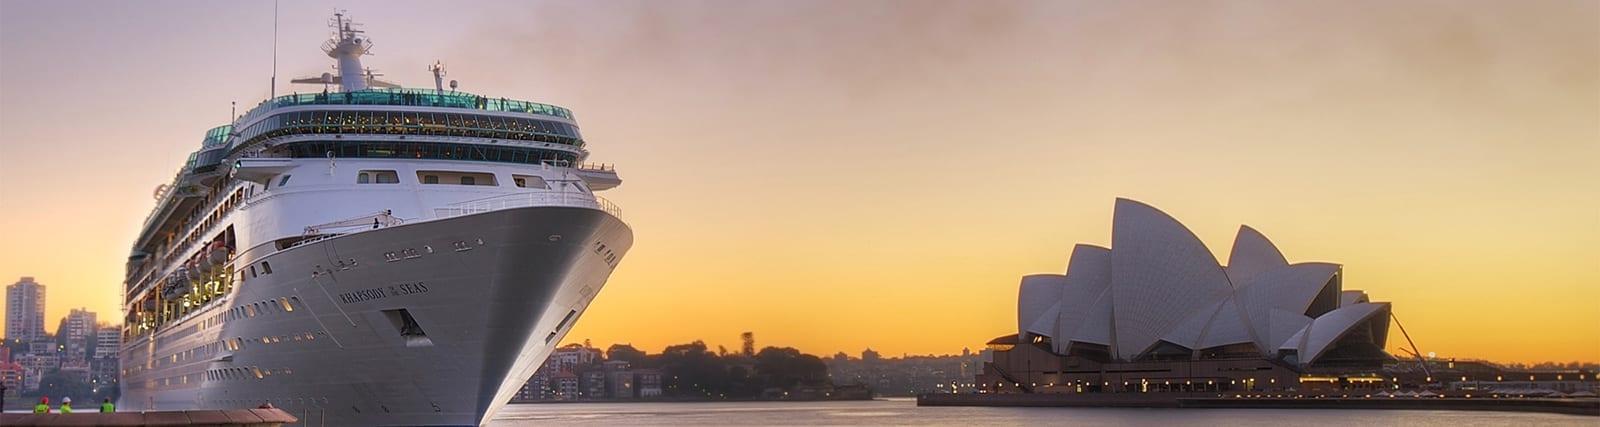 Rhapsody of the seas cruise